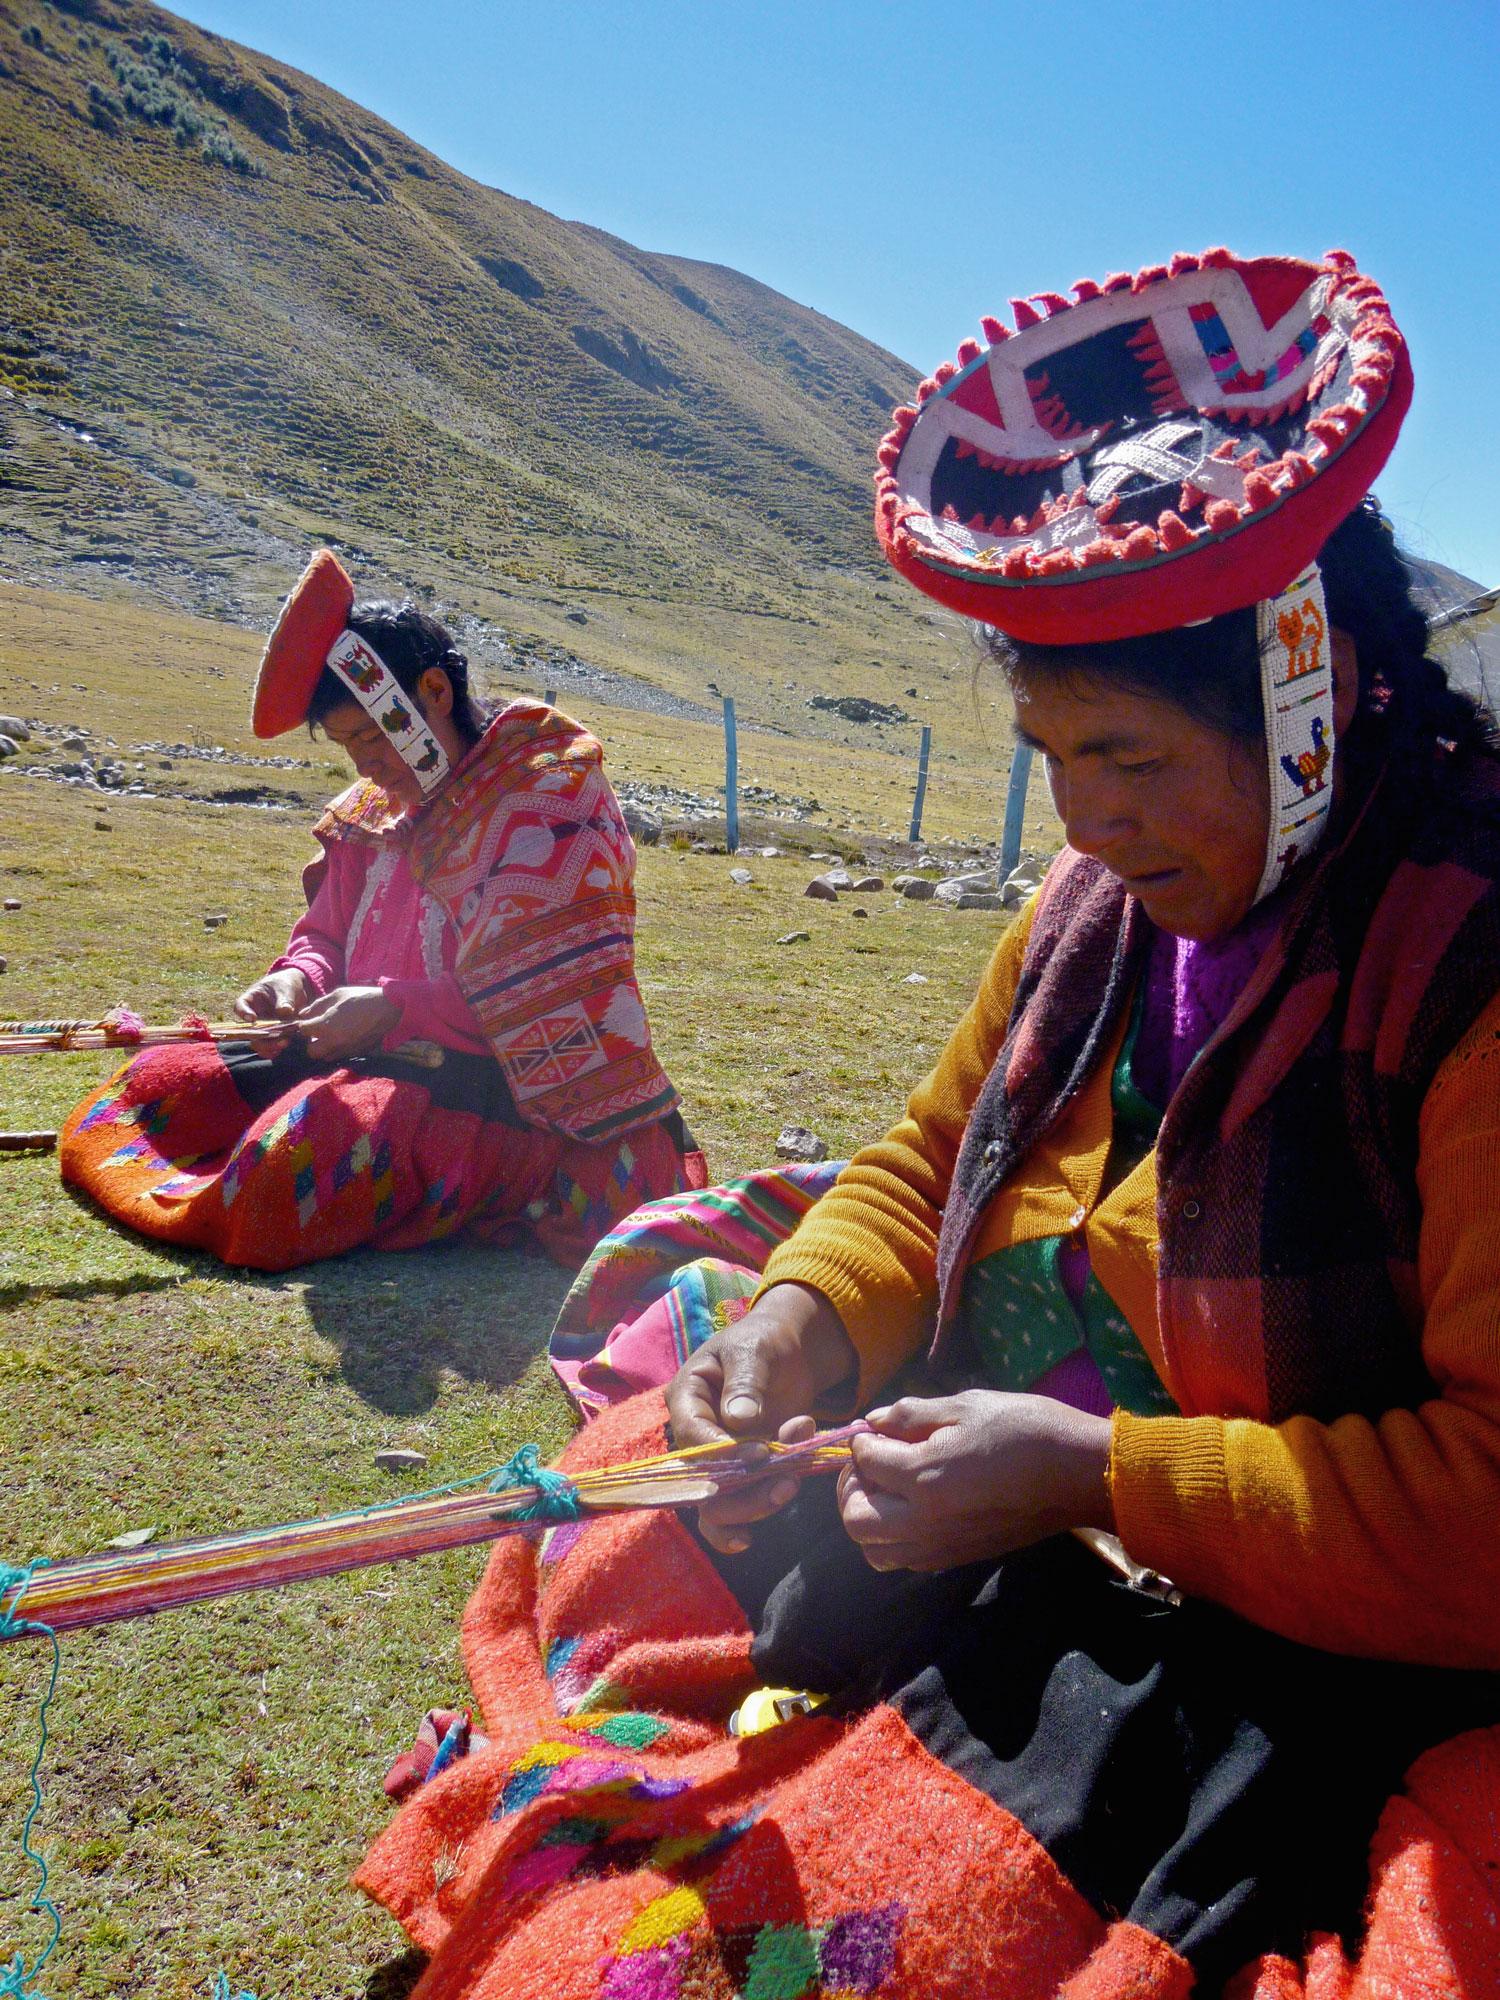 Artisan Weavers in Peru - www.nidocollective.com